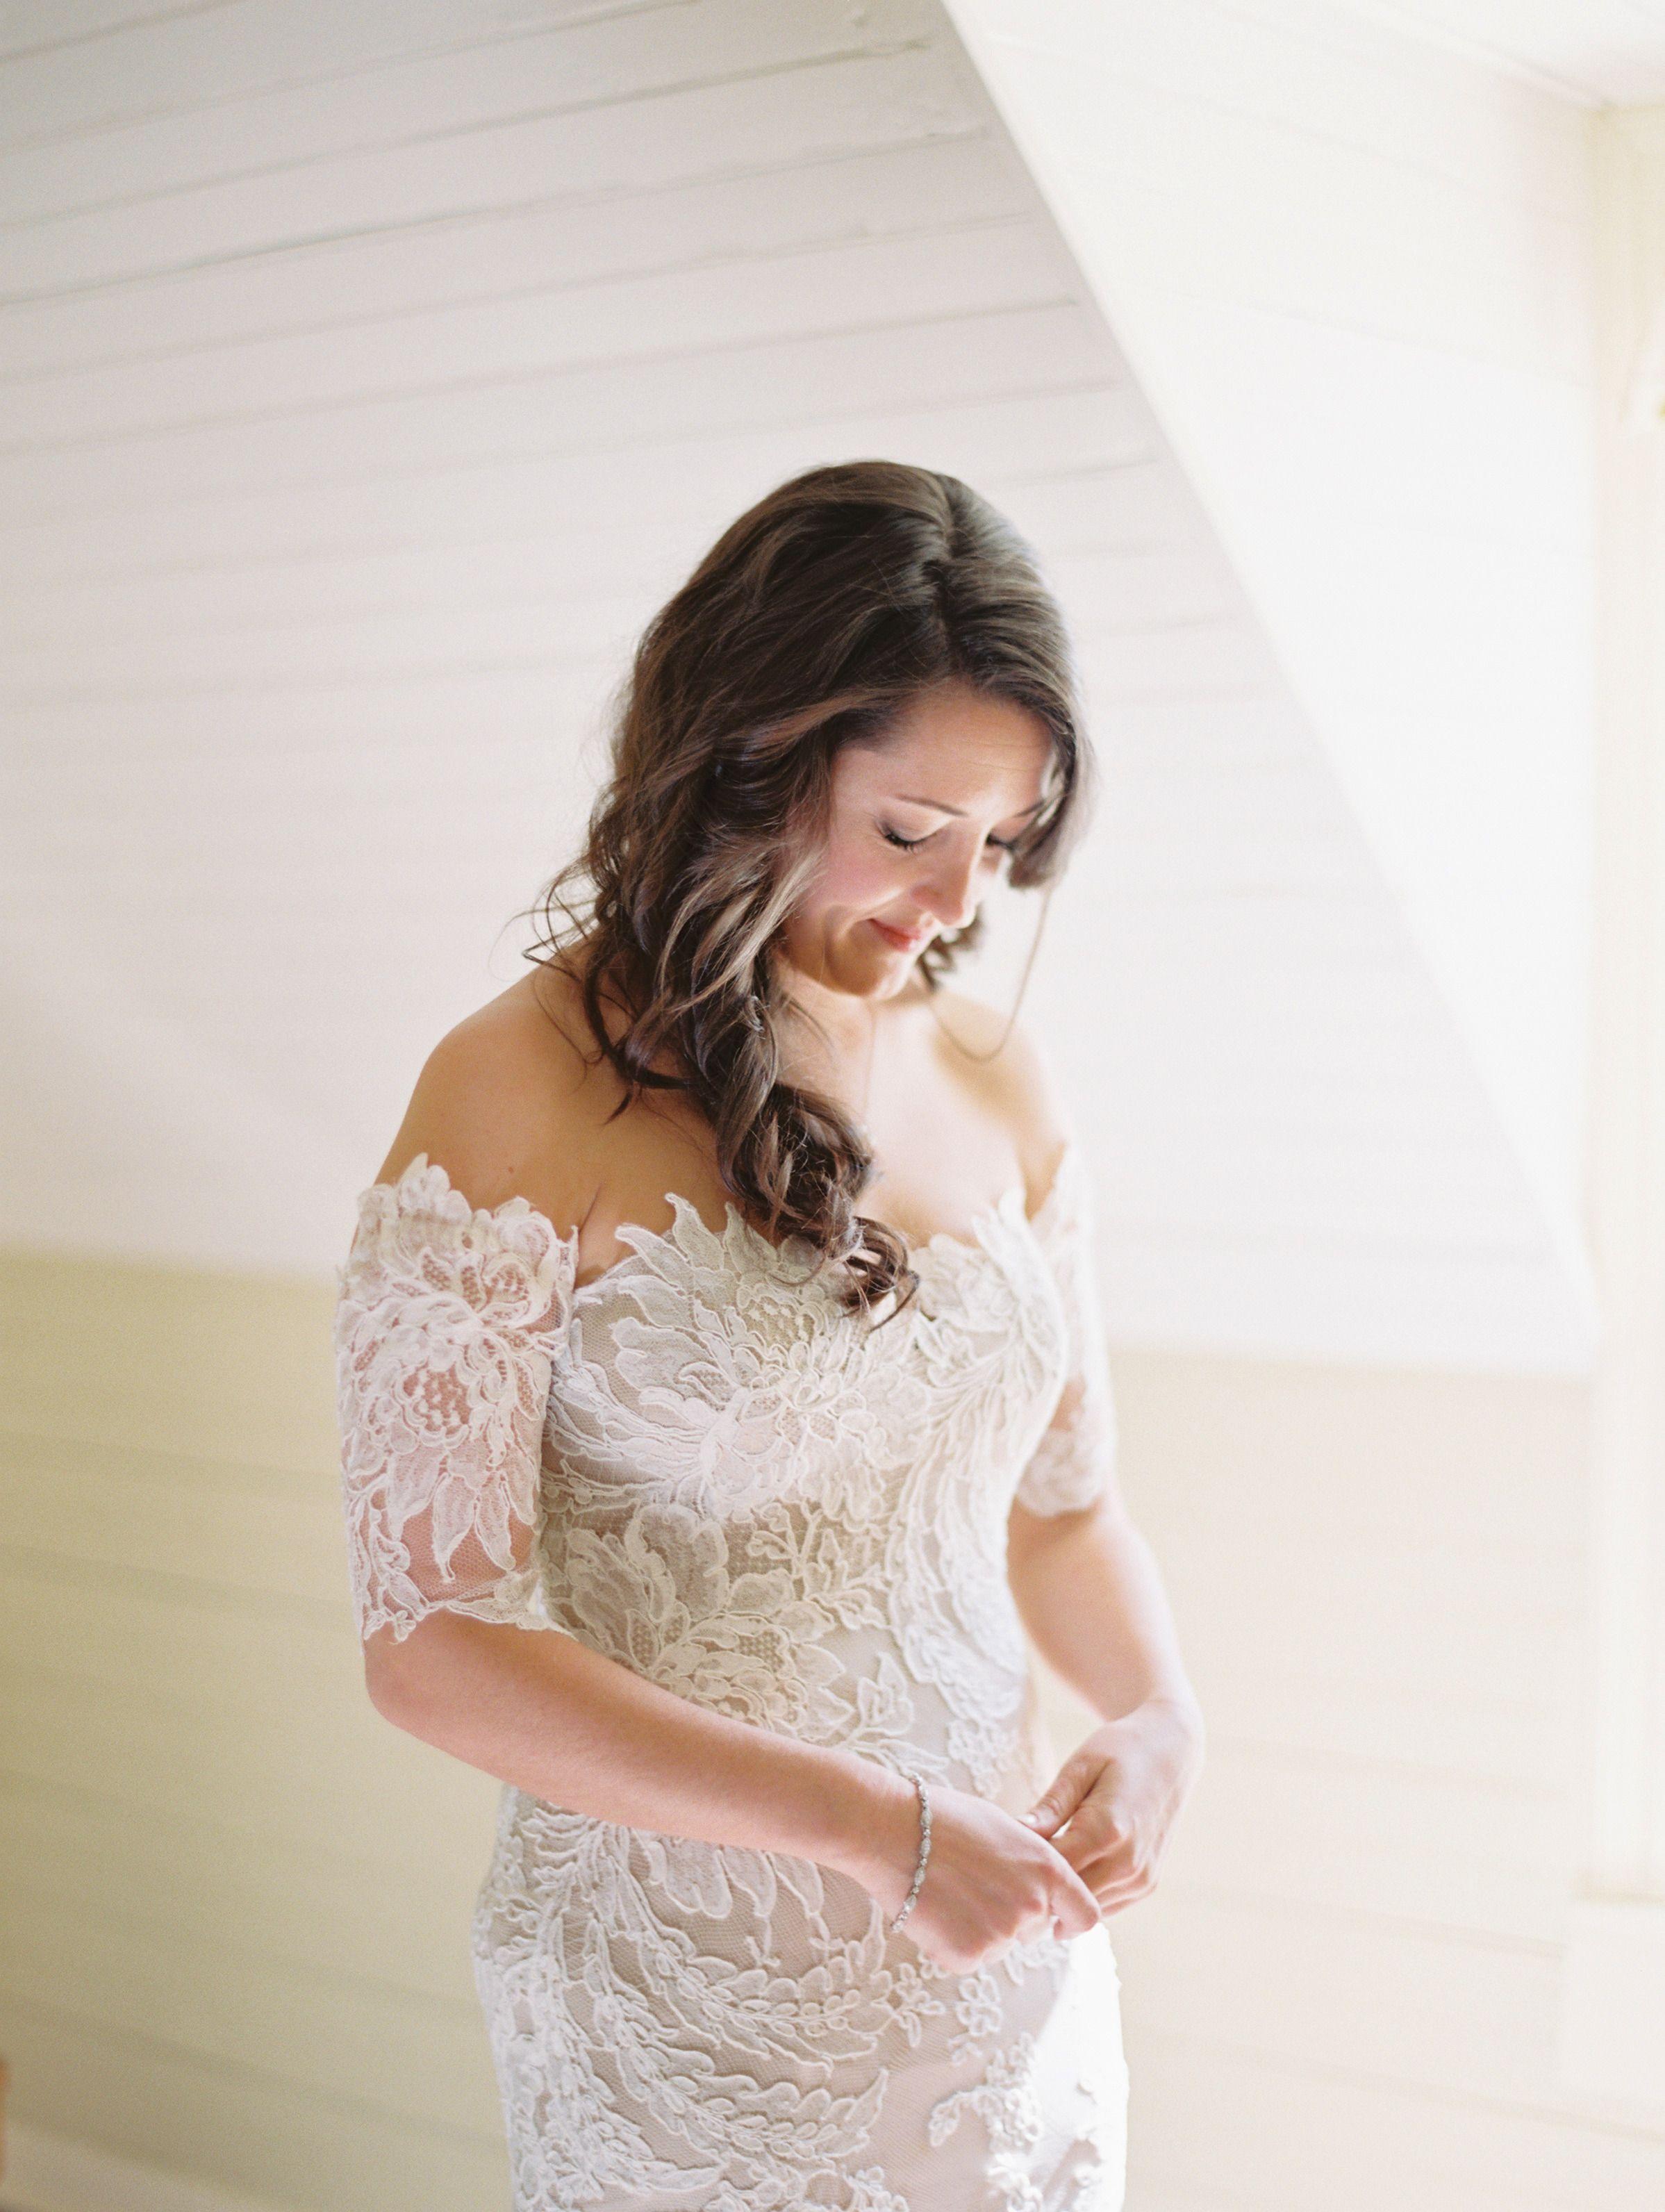 Anna Mair dress  Photography: Landon Jacob Productions - landonjacob.com  Read More: http://www.stylemepretty.com/2015/04/29/rustic-chic-old-edwards-inn-wedding/